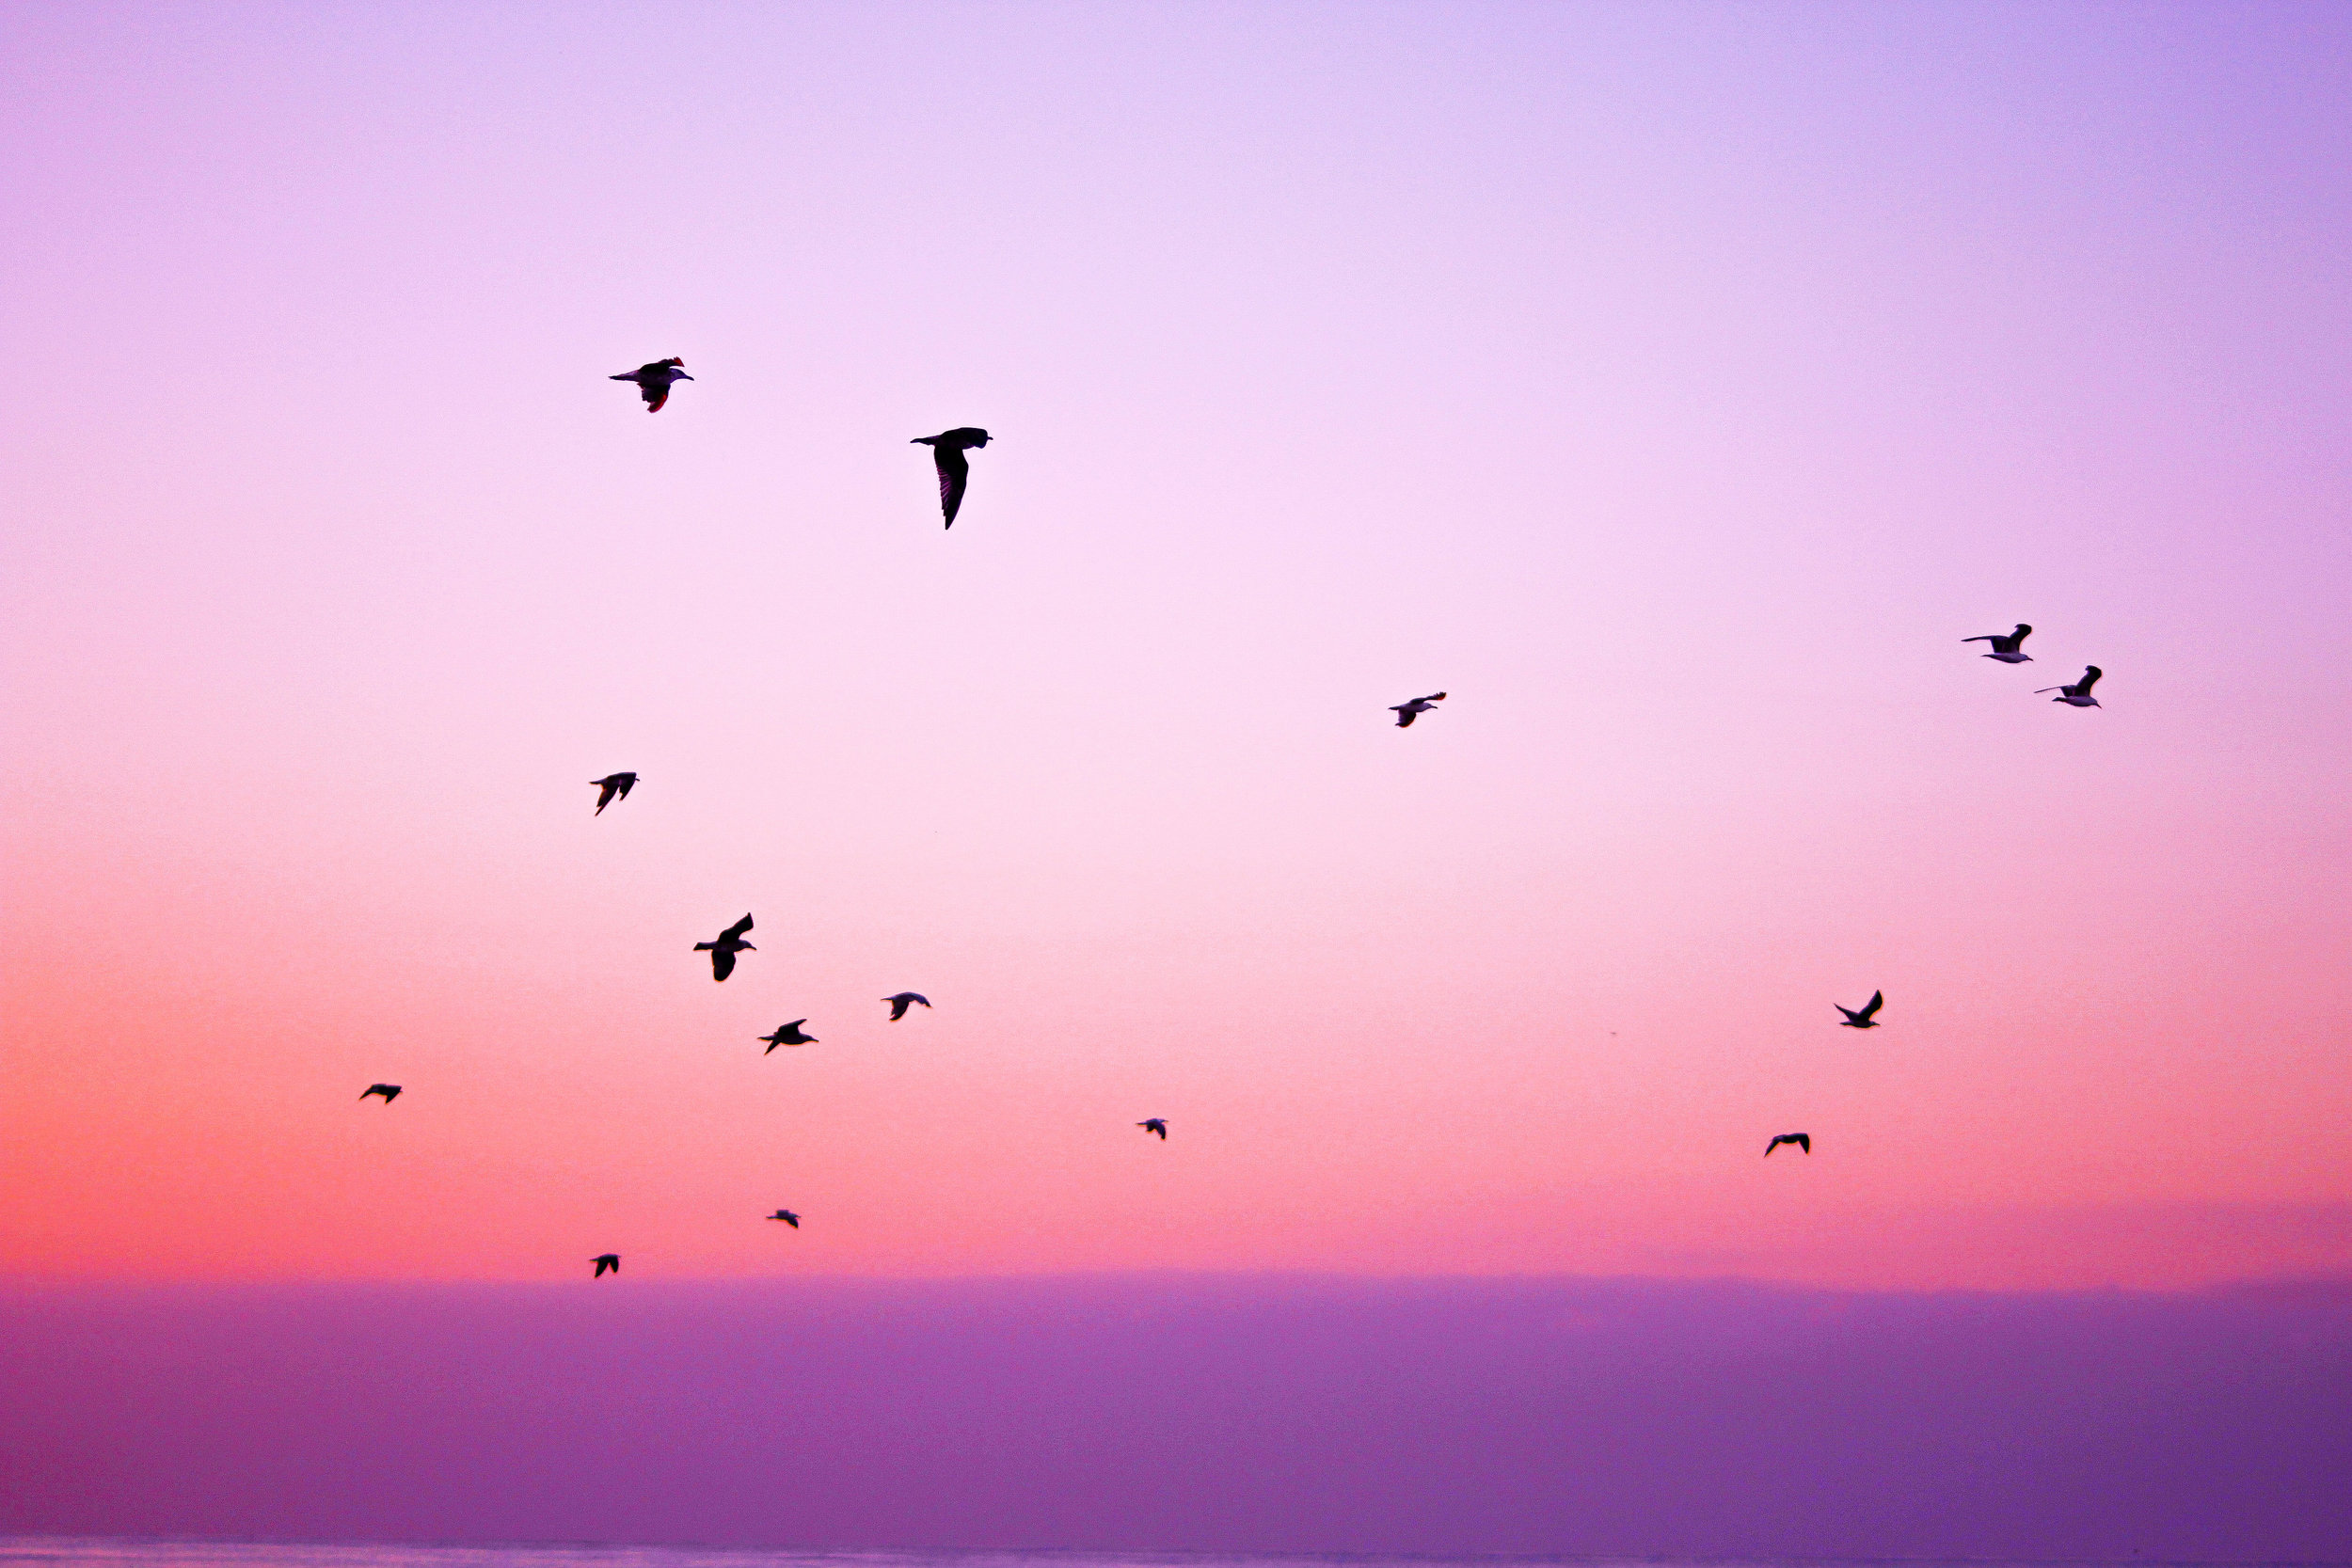 purple_birds.jpg